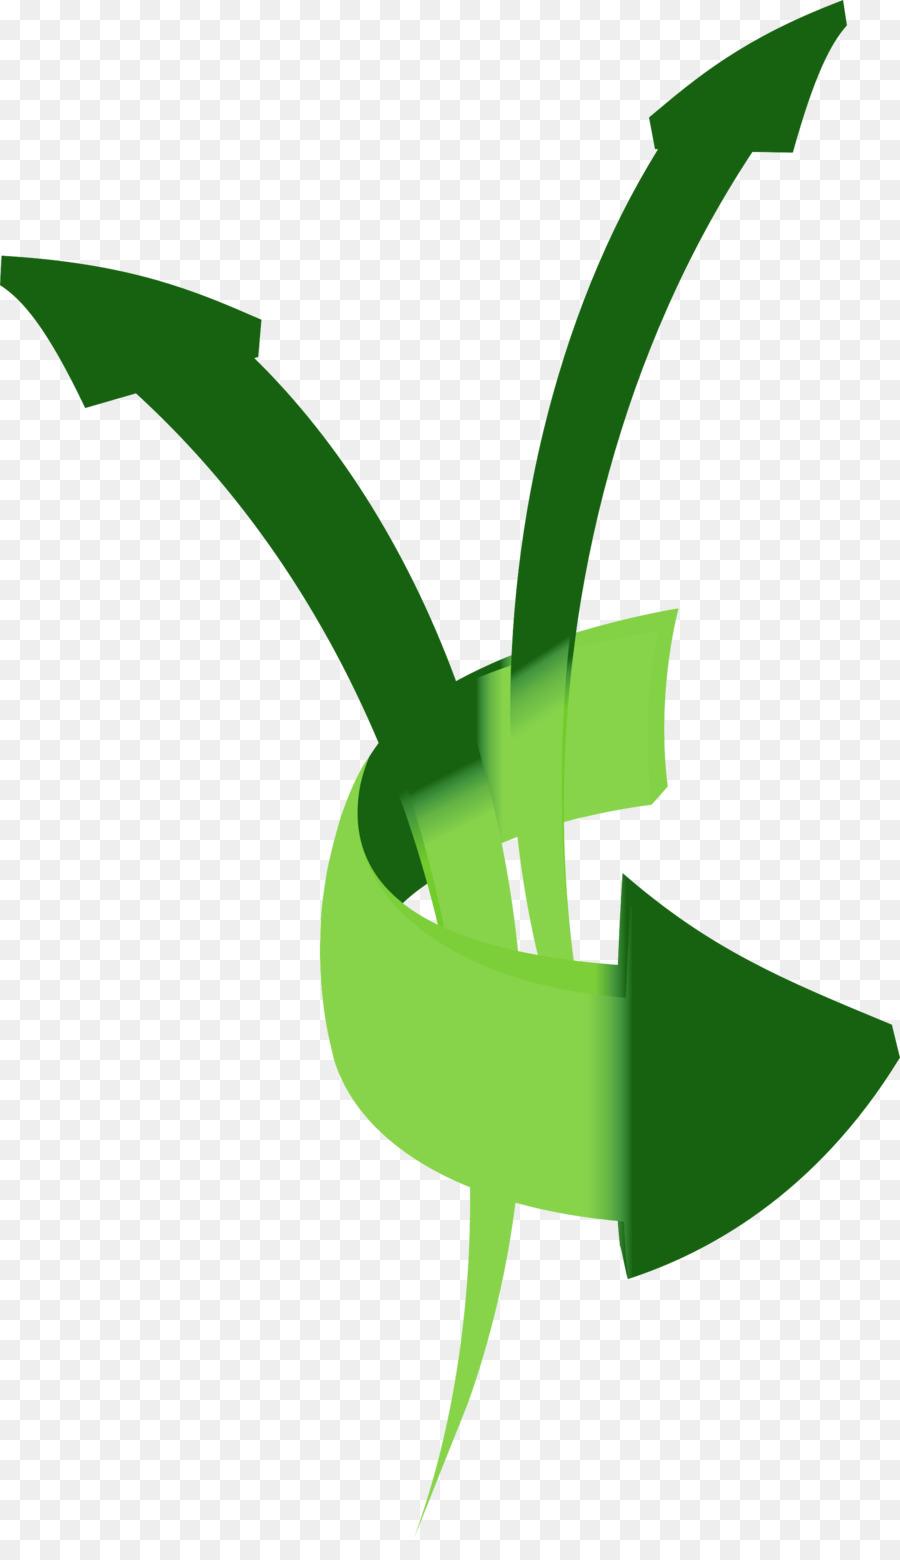 900x1560 Green Arrow